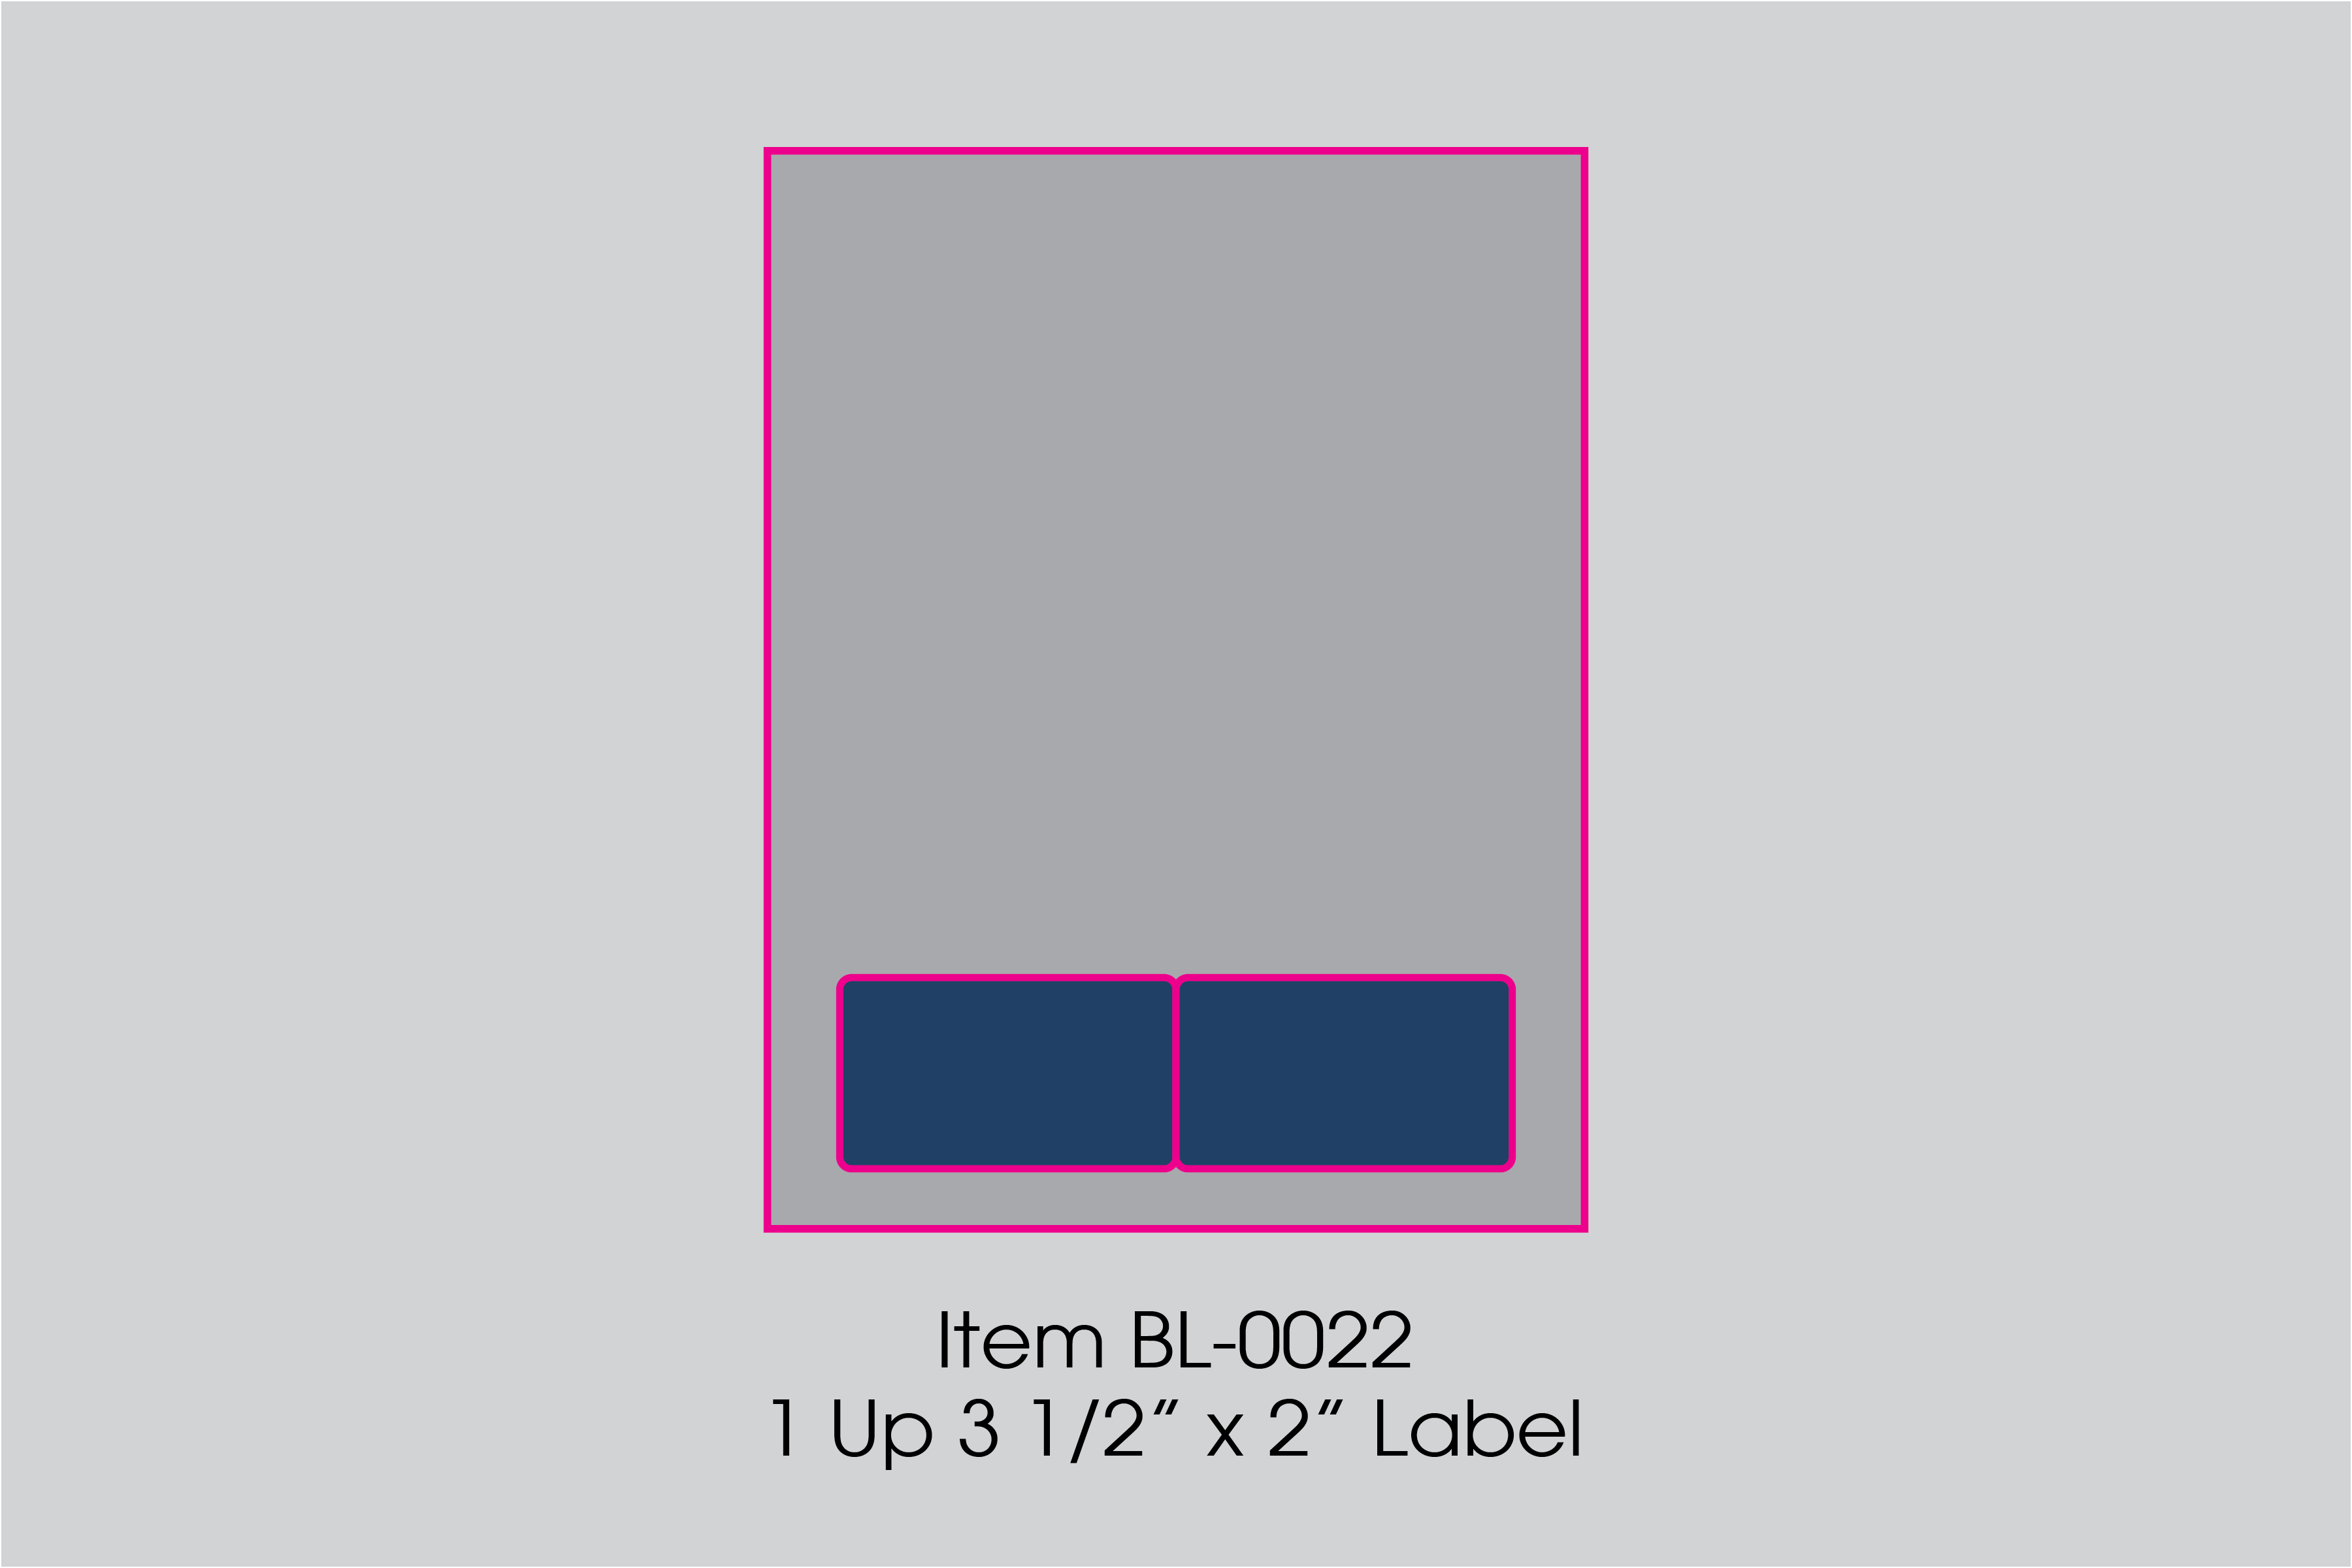 BL-0022